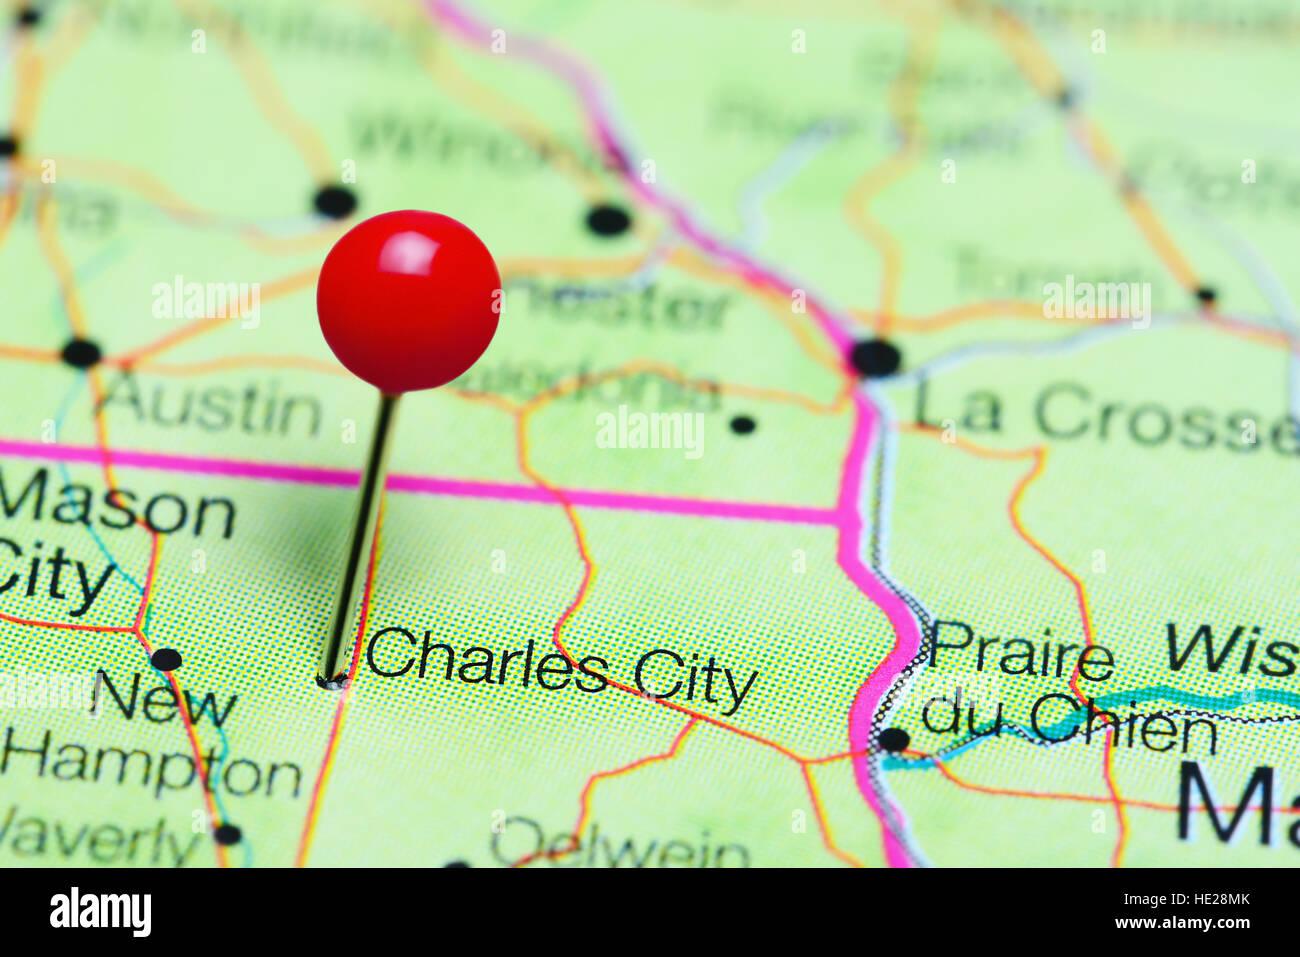 Charles City Pinned On A Map Of Iowa Usa Stock Photo 129128515 Alamy